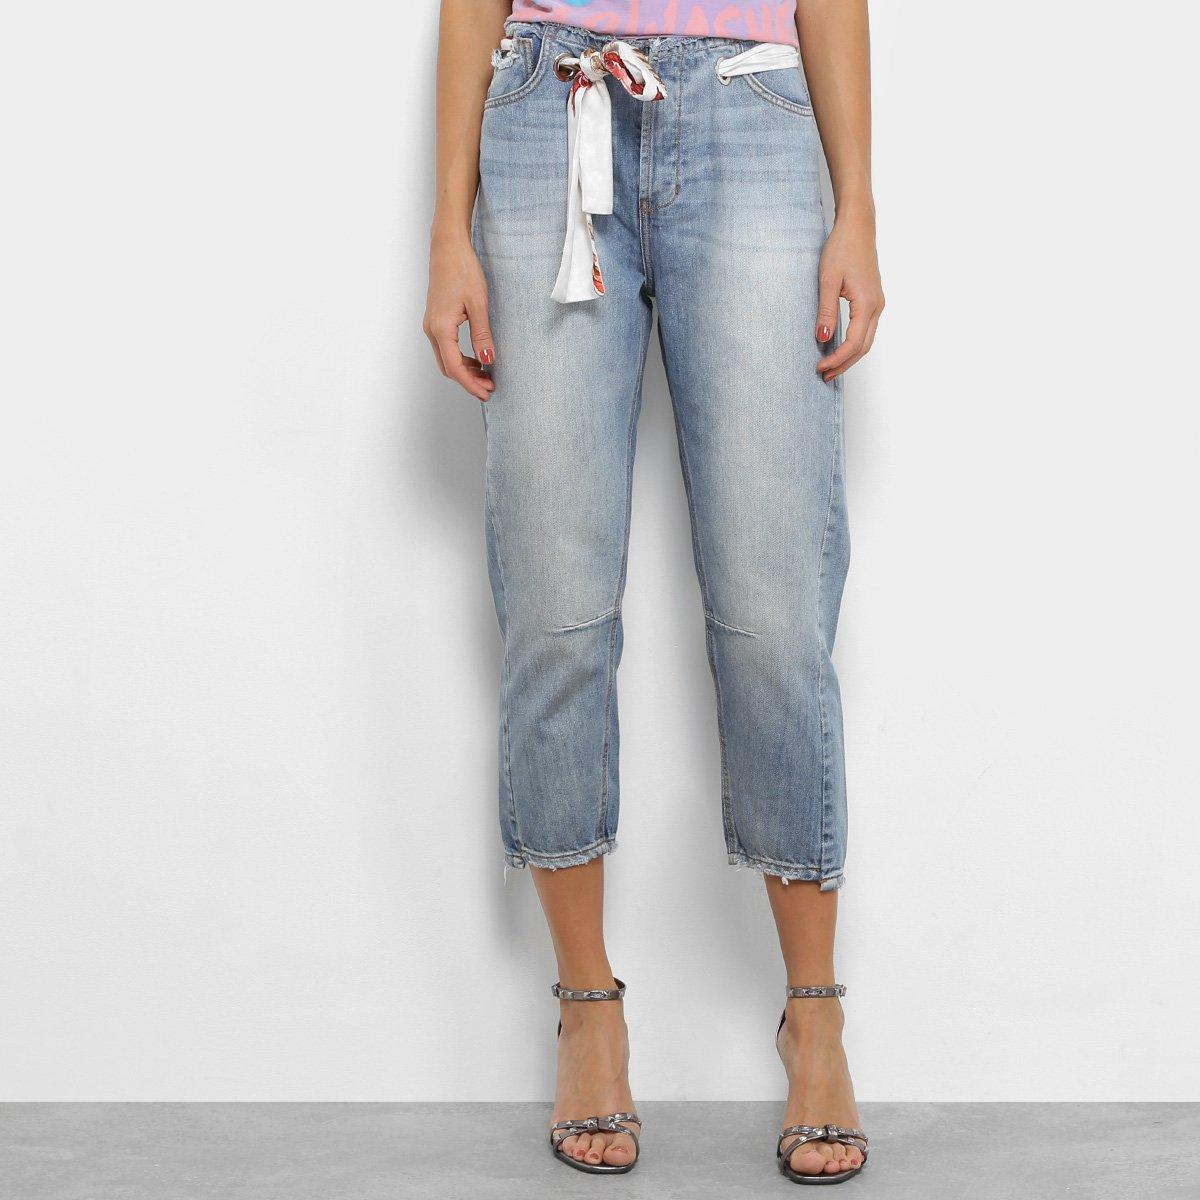 e25a43ee6 Calça Jeans Capri Coca-Cola Faixa Cintura Baixa Feminina